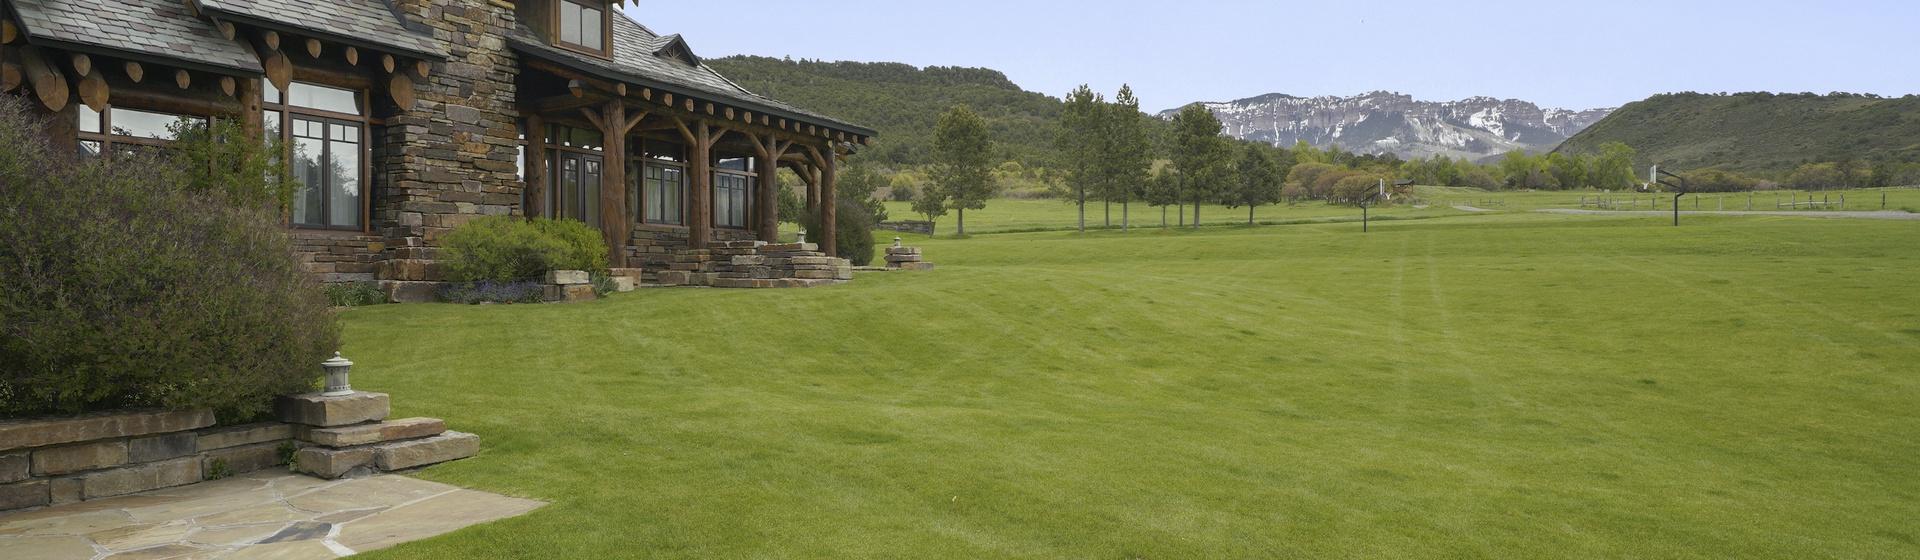 0.2-Telluride-Sleeping-Indian-Ranch-exterior-west-wing-web.JPG